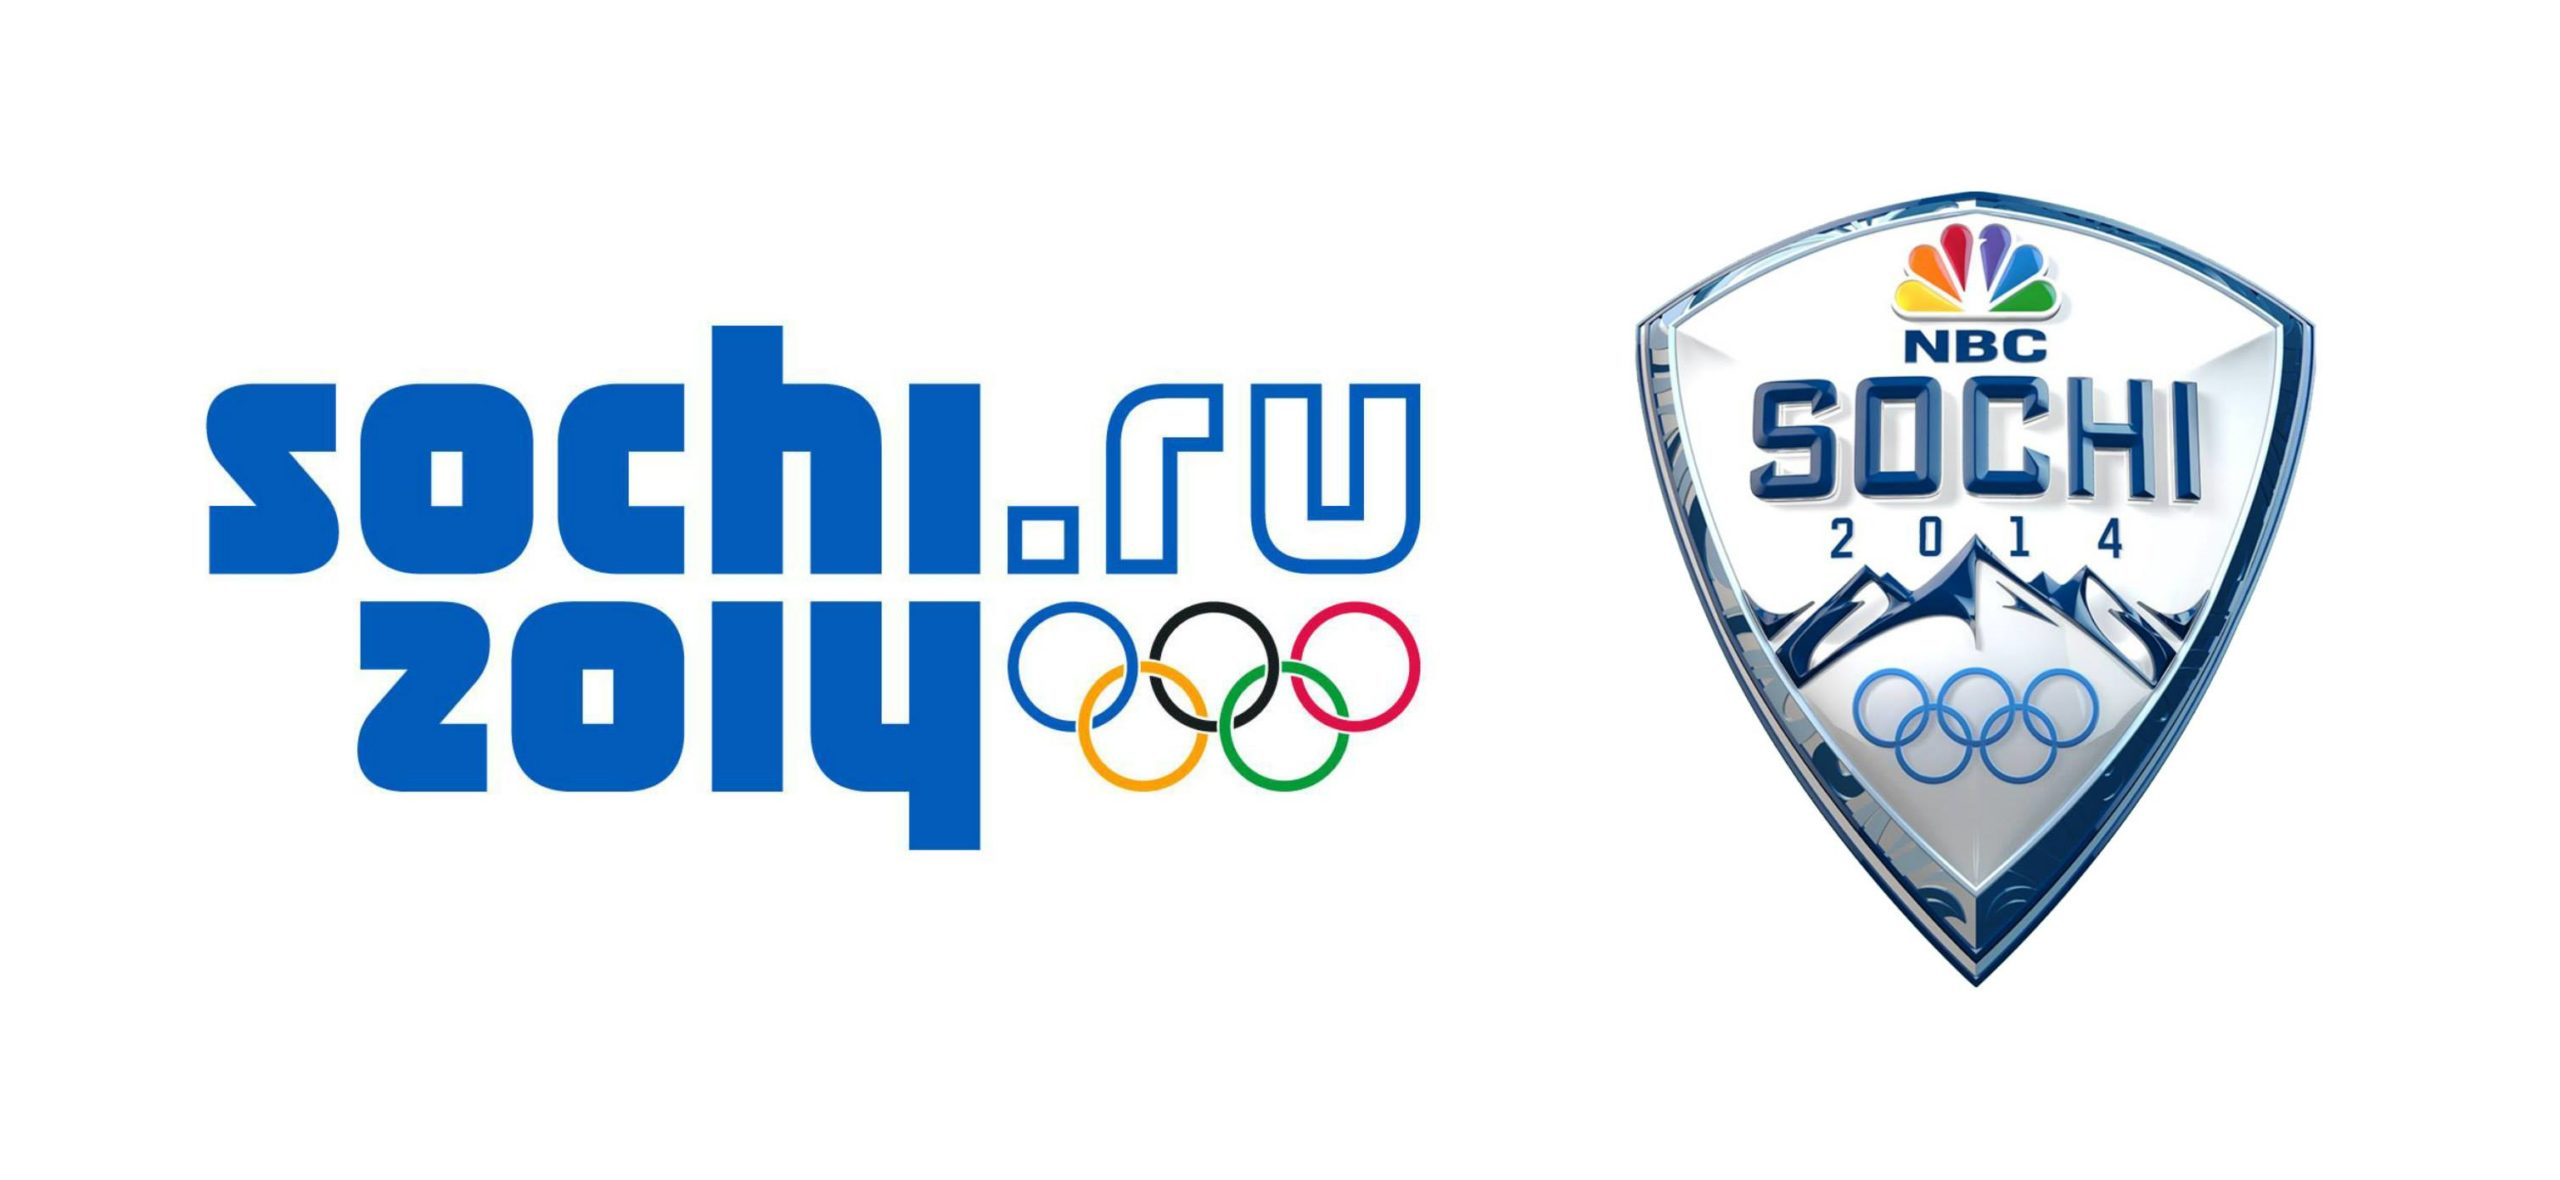 sochi-russia-winter-olympics-2014-victor-ruano-santasombra-nbc